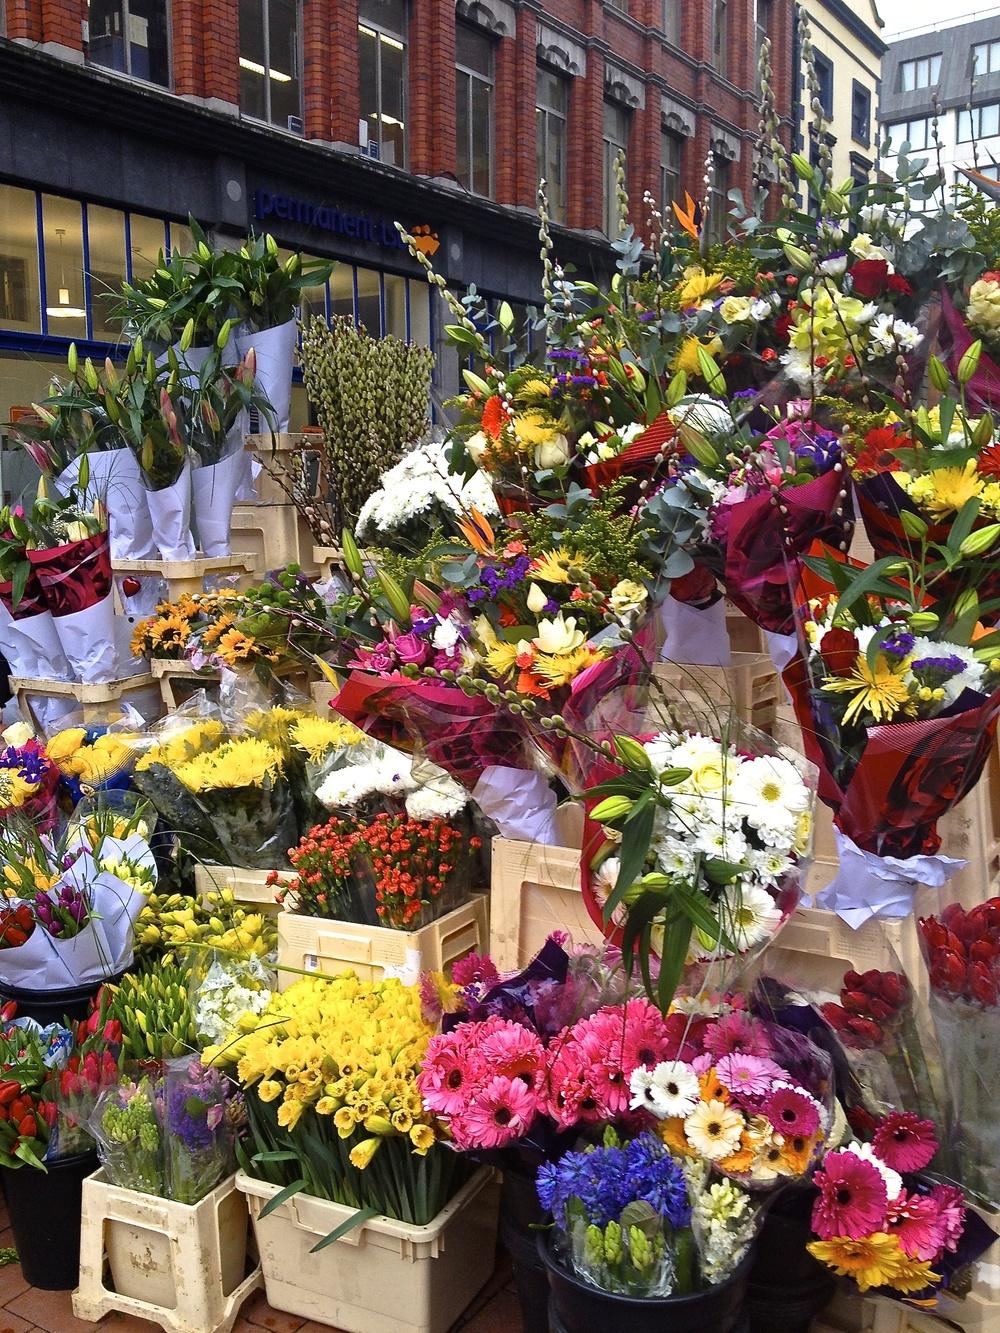 Flower Market, Dublin, Ireland  Photography by Judy Uelk